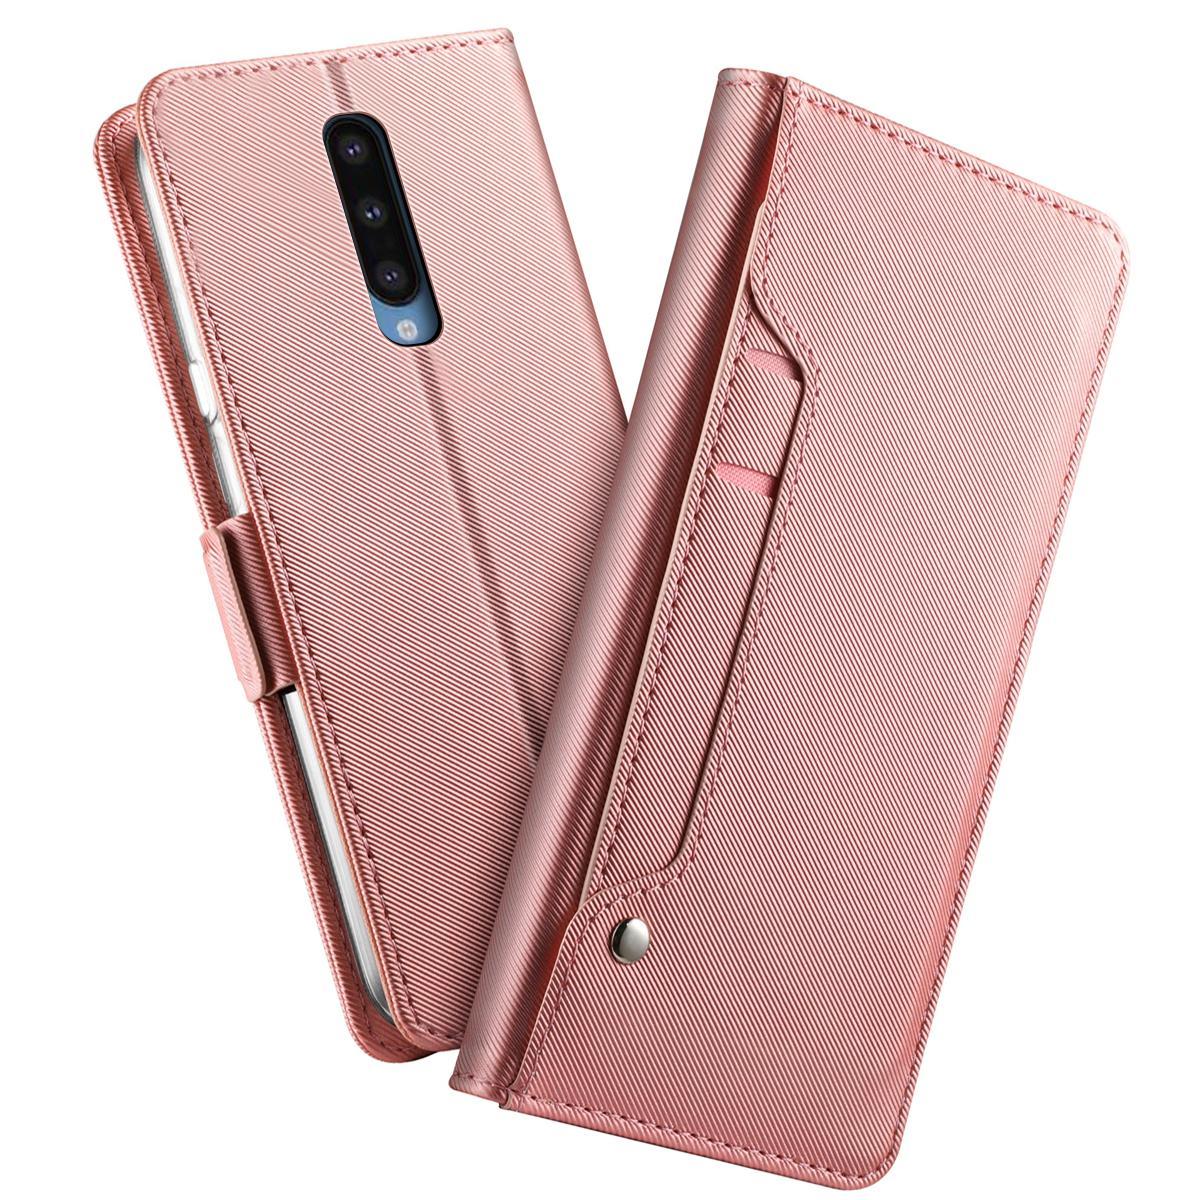 Plånboksfodral Spegel OnePlus 8 Rosa Guld